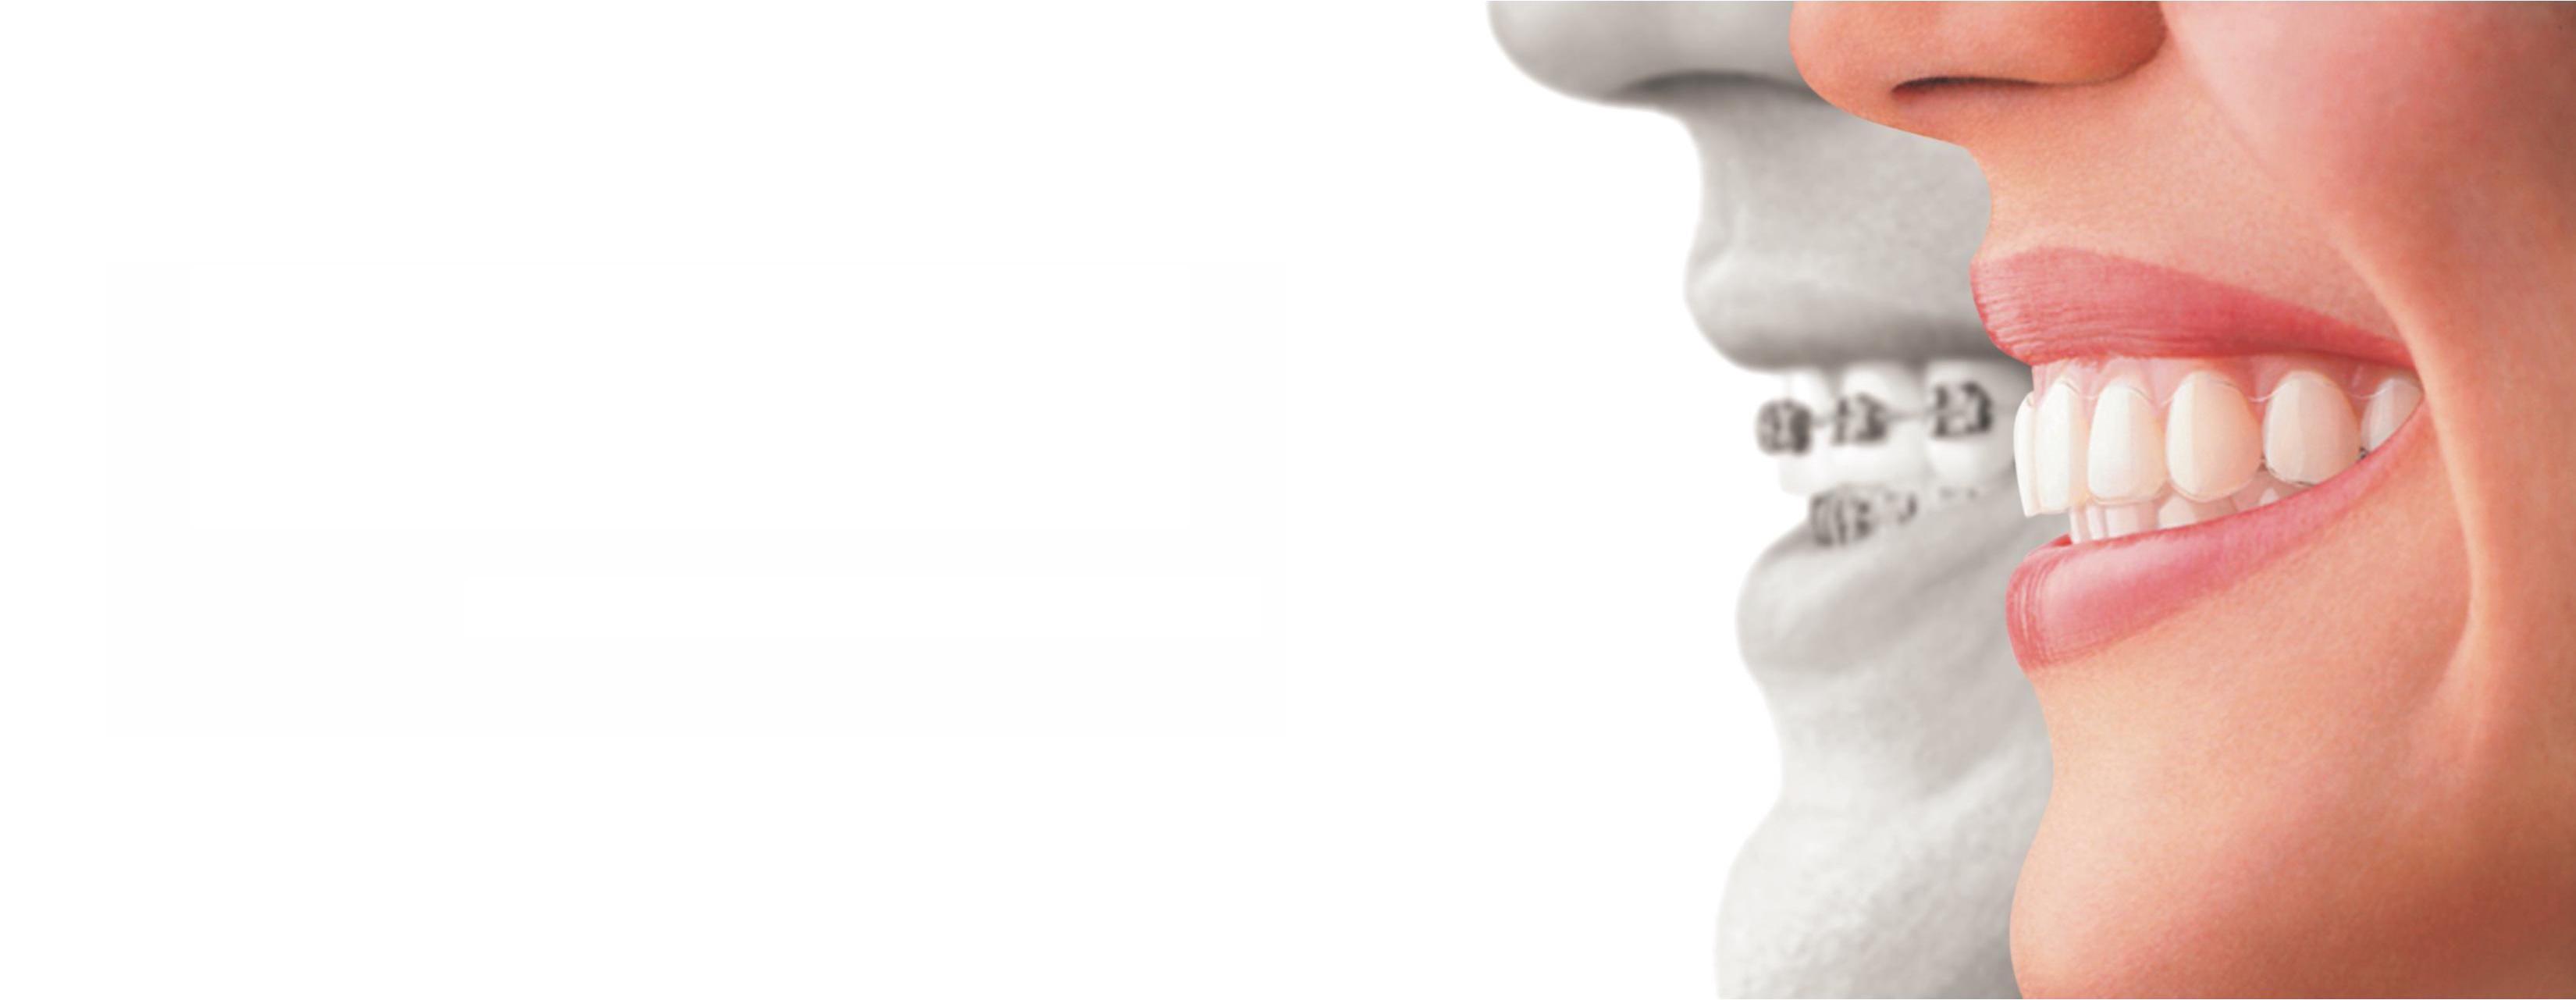 Ortodoncia Invisalign® | druiz Instituto Médico Dental en Burgos